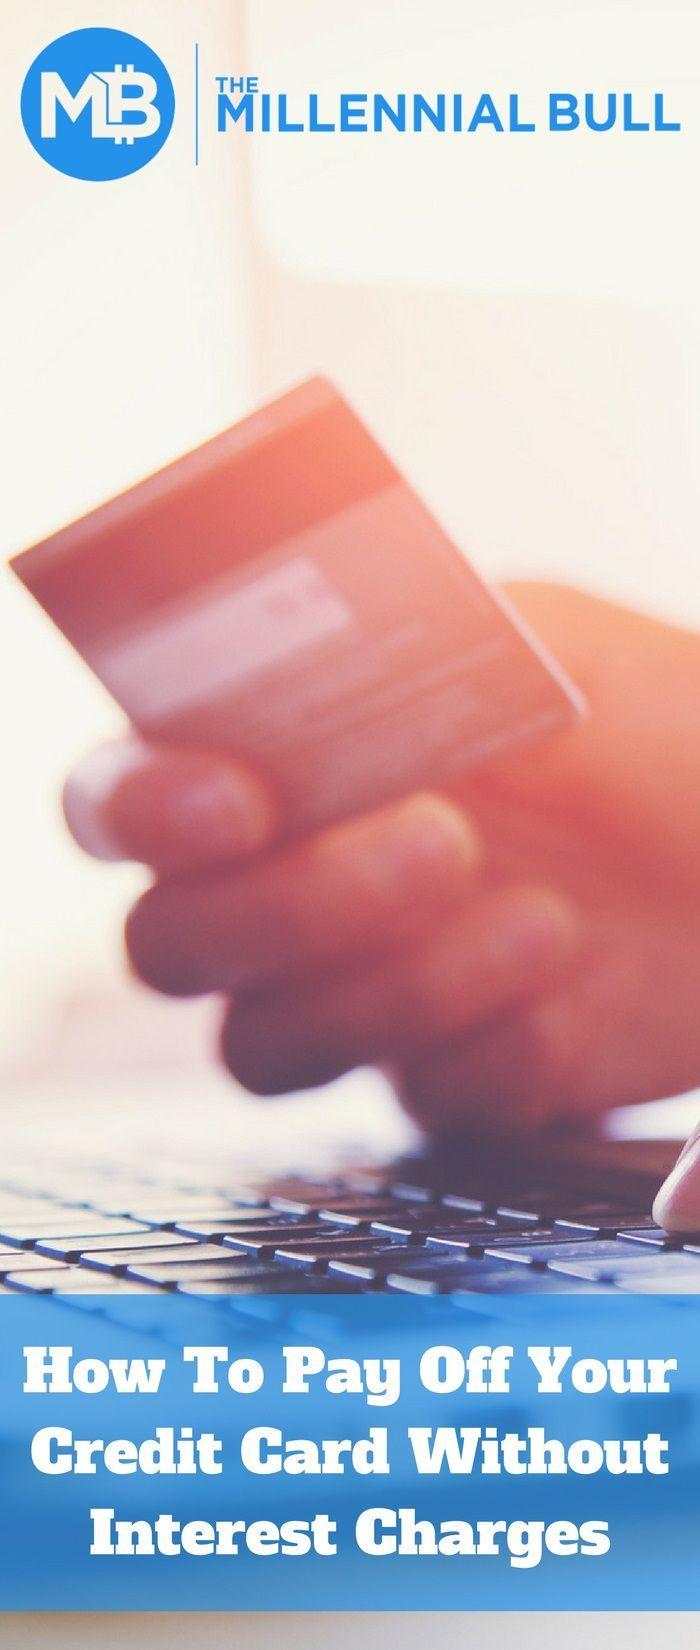 Credit Card Debt | Get Out Of Debt | Credit Card Interest | Credit Card Debt Payoff | No Interest Credit Cards | Interest Free Credit Cards | Credit Card Tips